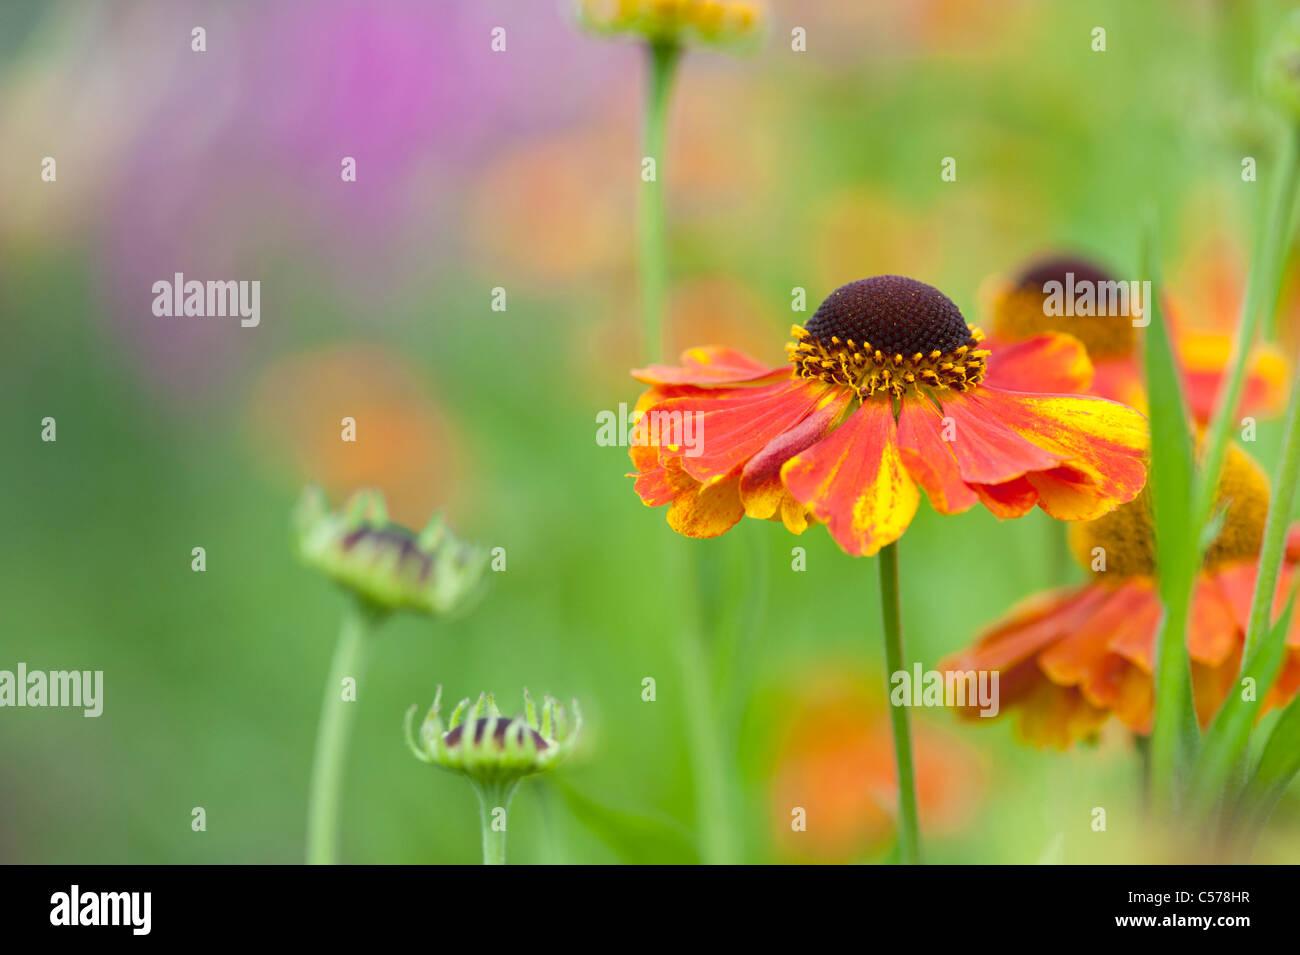 Helenium 'sahin presto flowerer'. Fiore Sneezeweed Foto Stock